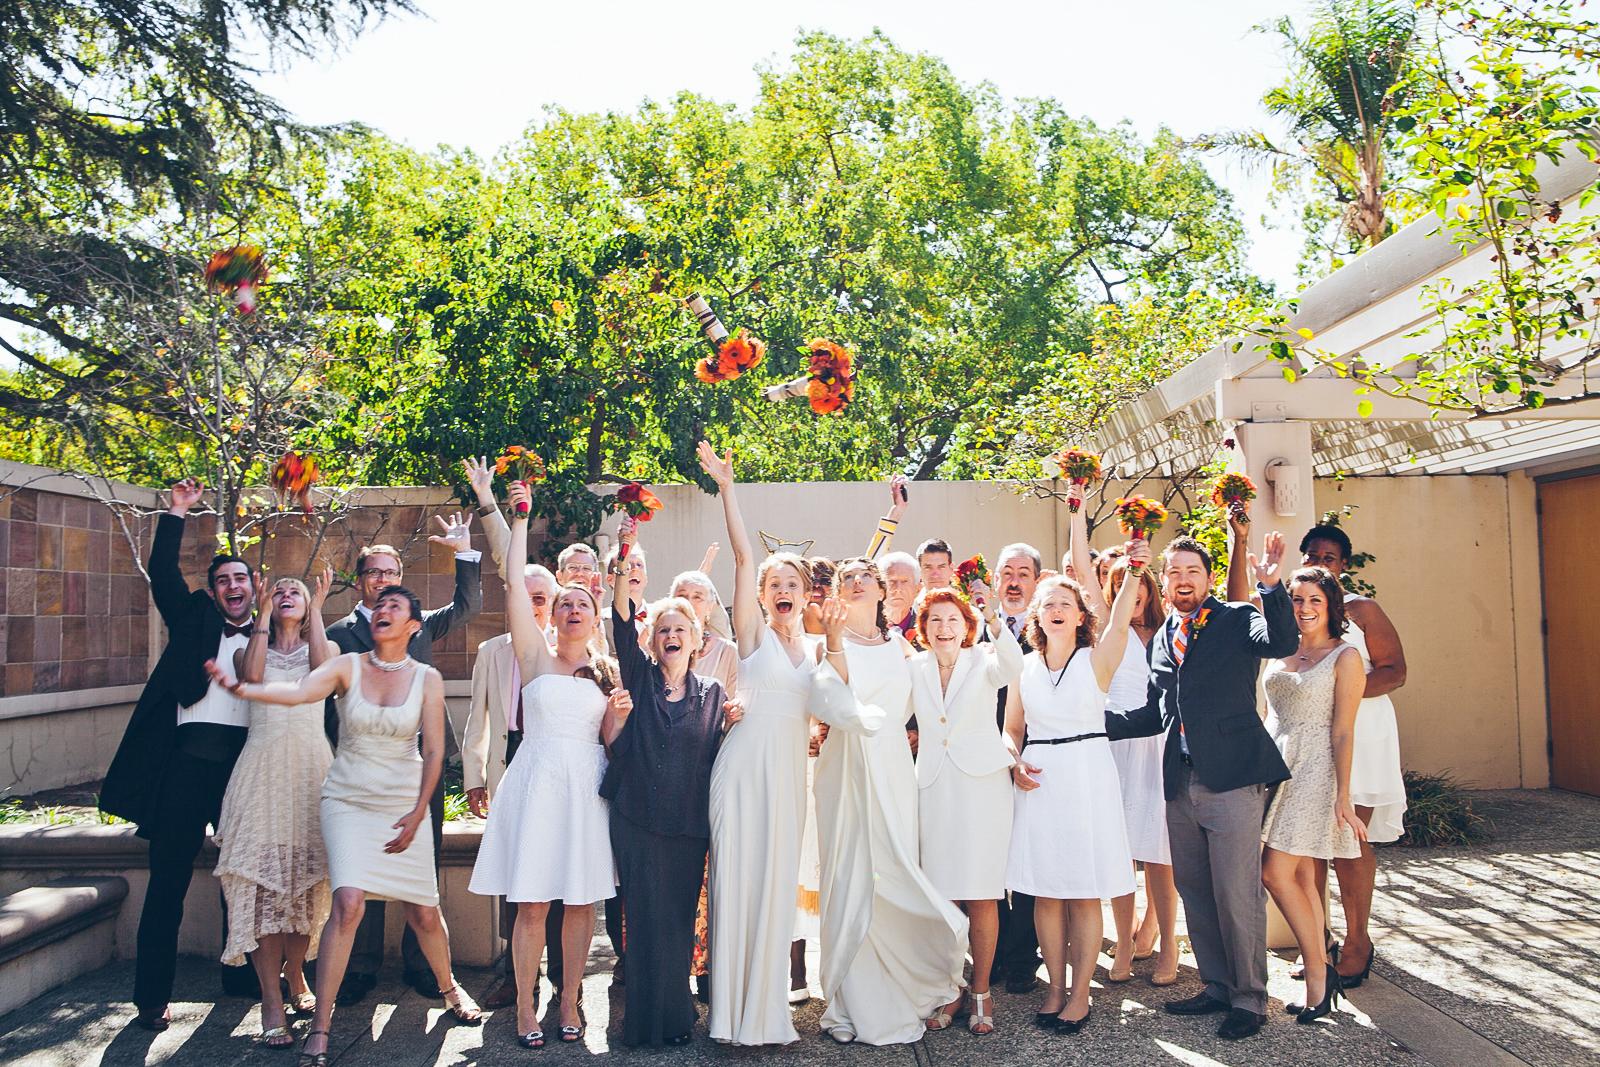 Riverside_ca_wedding_photography_marguerite_carolyn_ebony_siovhan_bokeh_photography_39.jpg